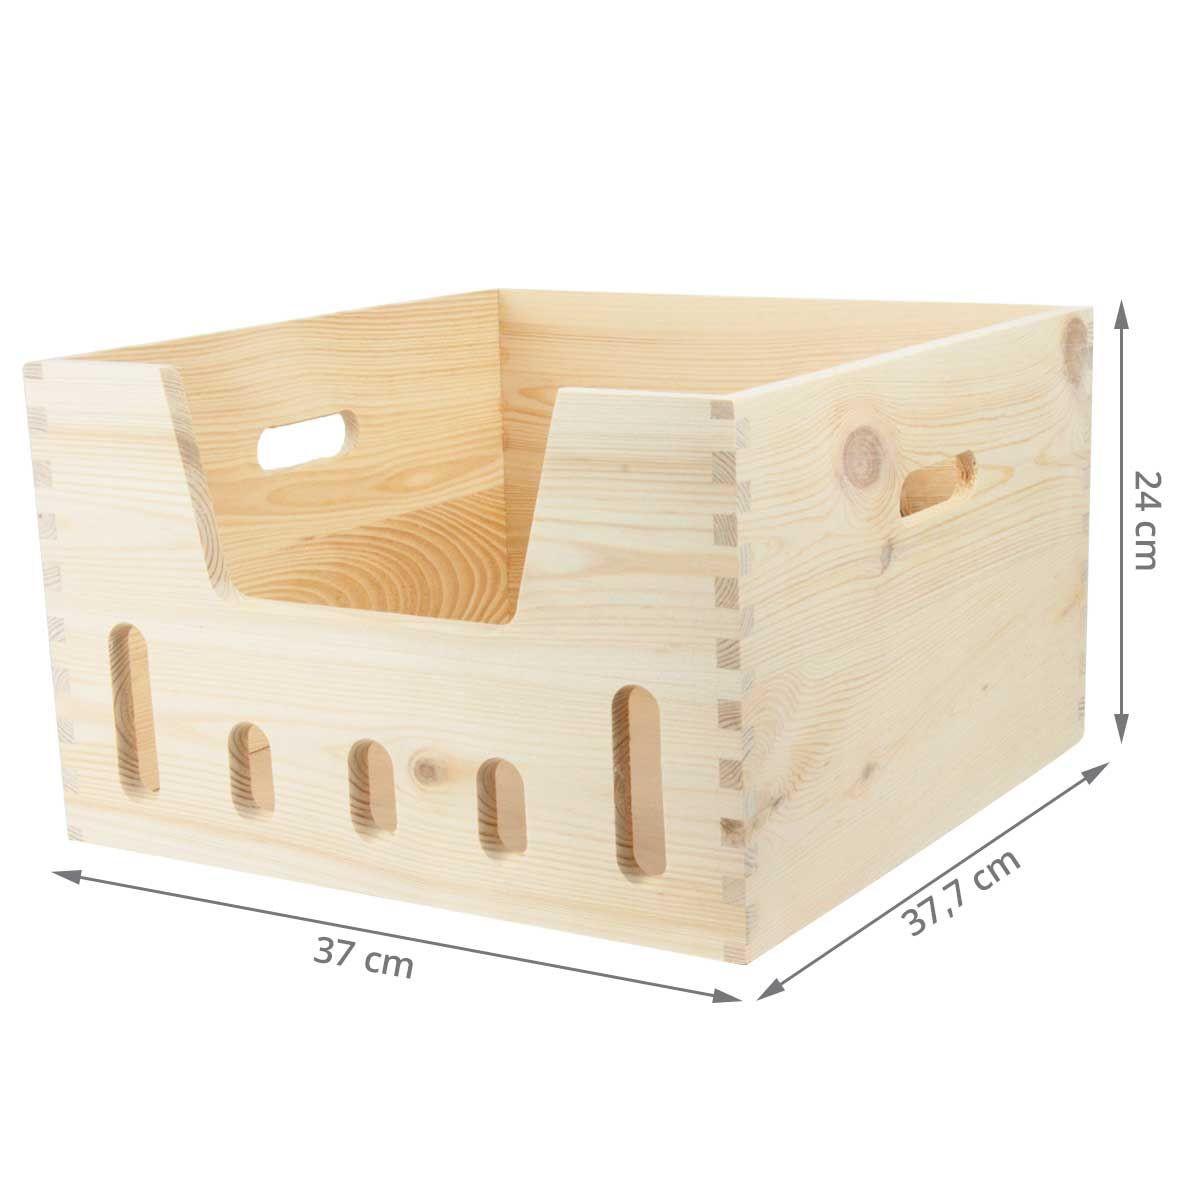 caisse de rangement empilable en pin brut. Black Bedroom Furniture Sets. Home Design Ideas